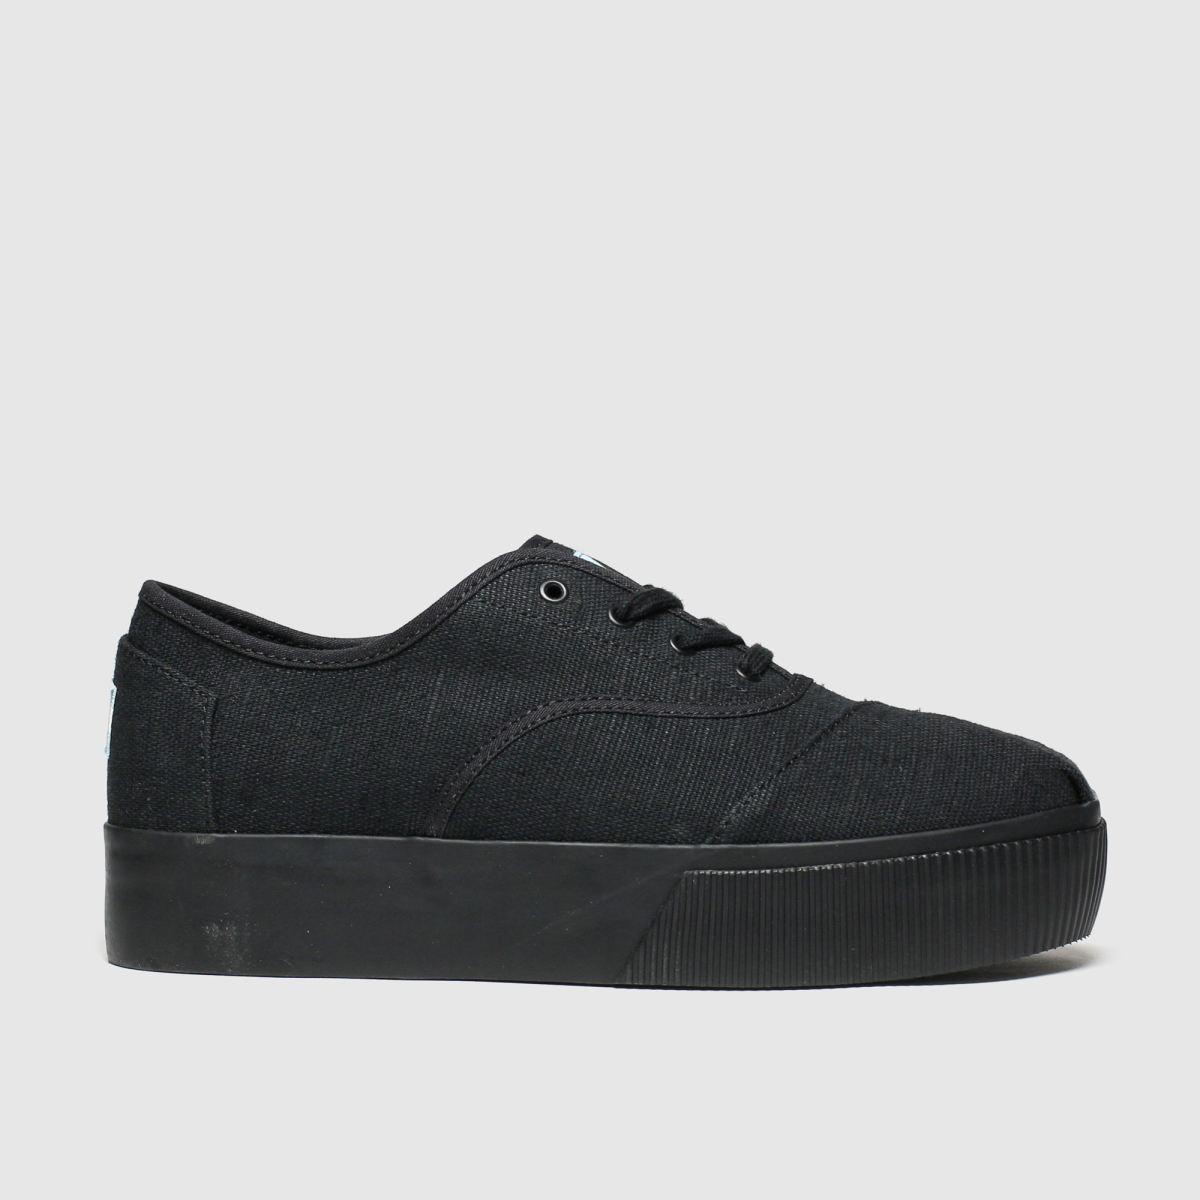 Toms Black Cordones Platform Vegan Flat Shoes